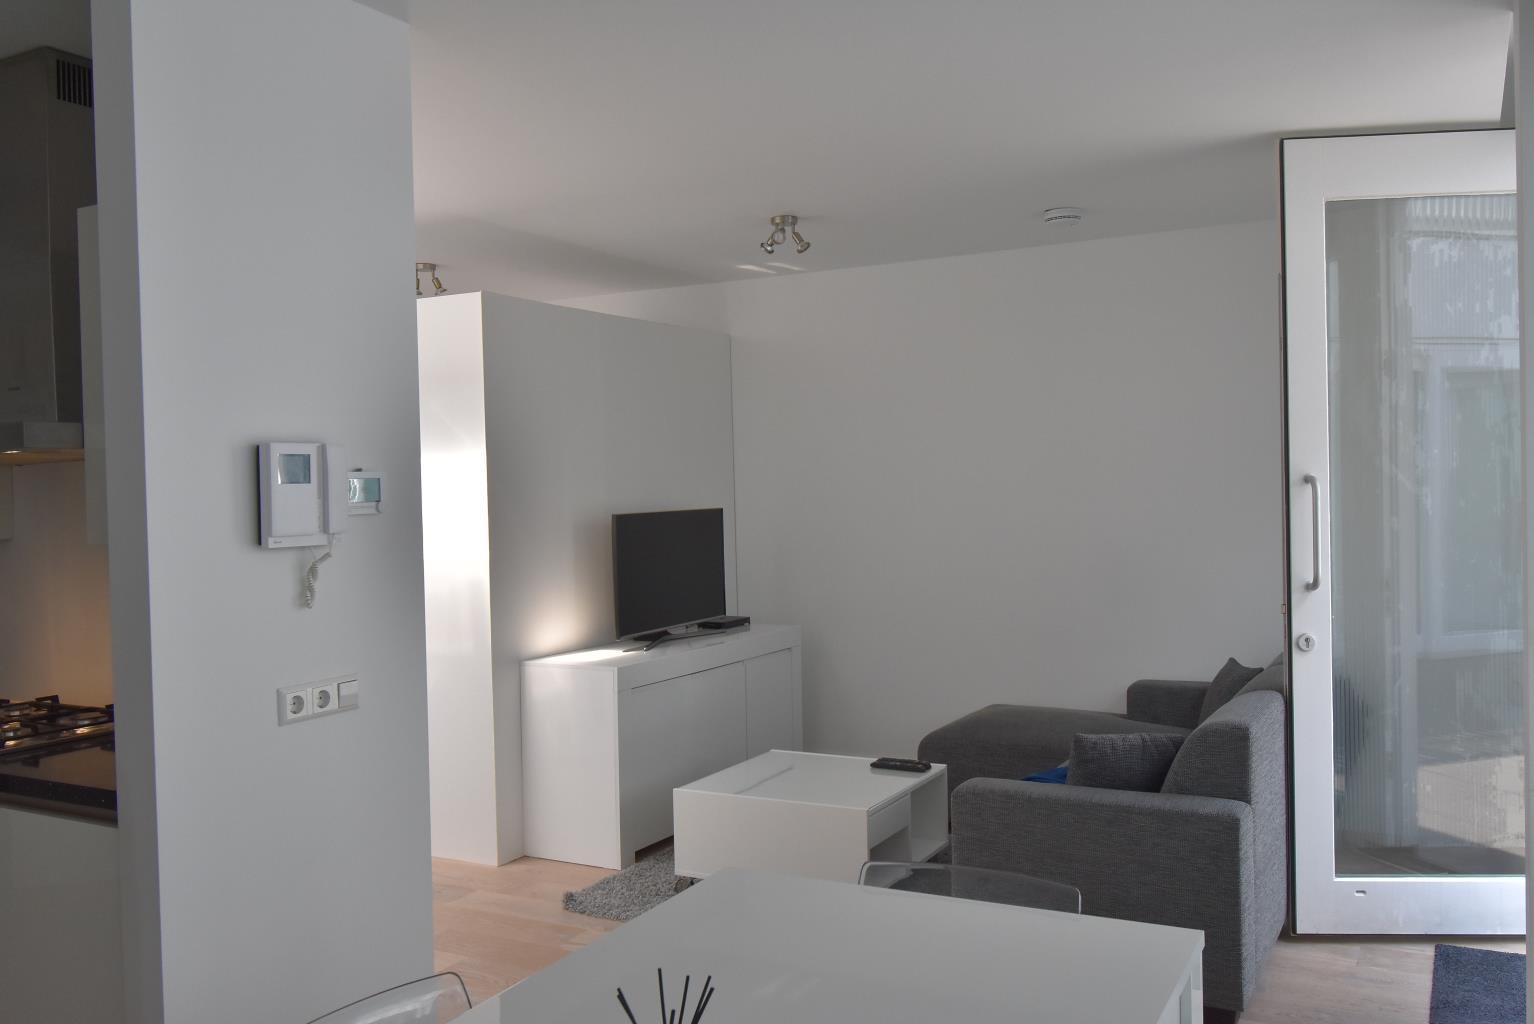 Baarsjesweg, Suite d, Amsterdam